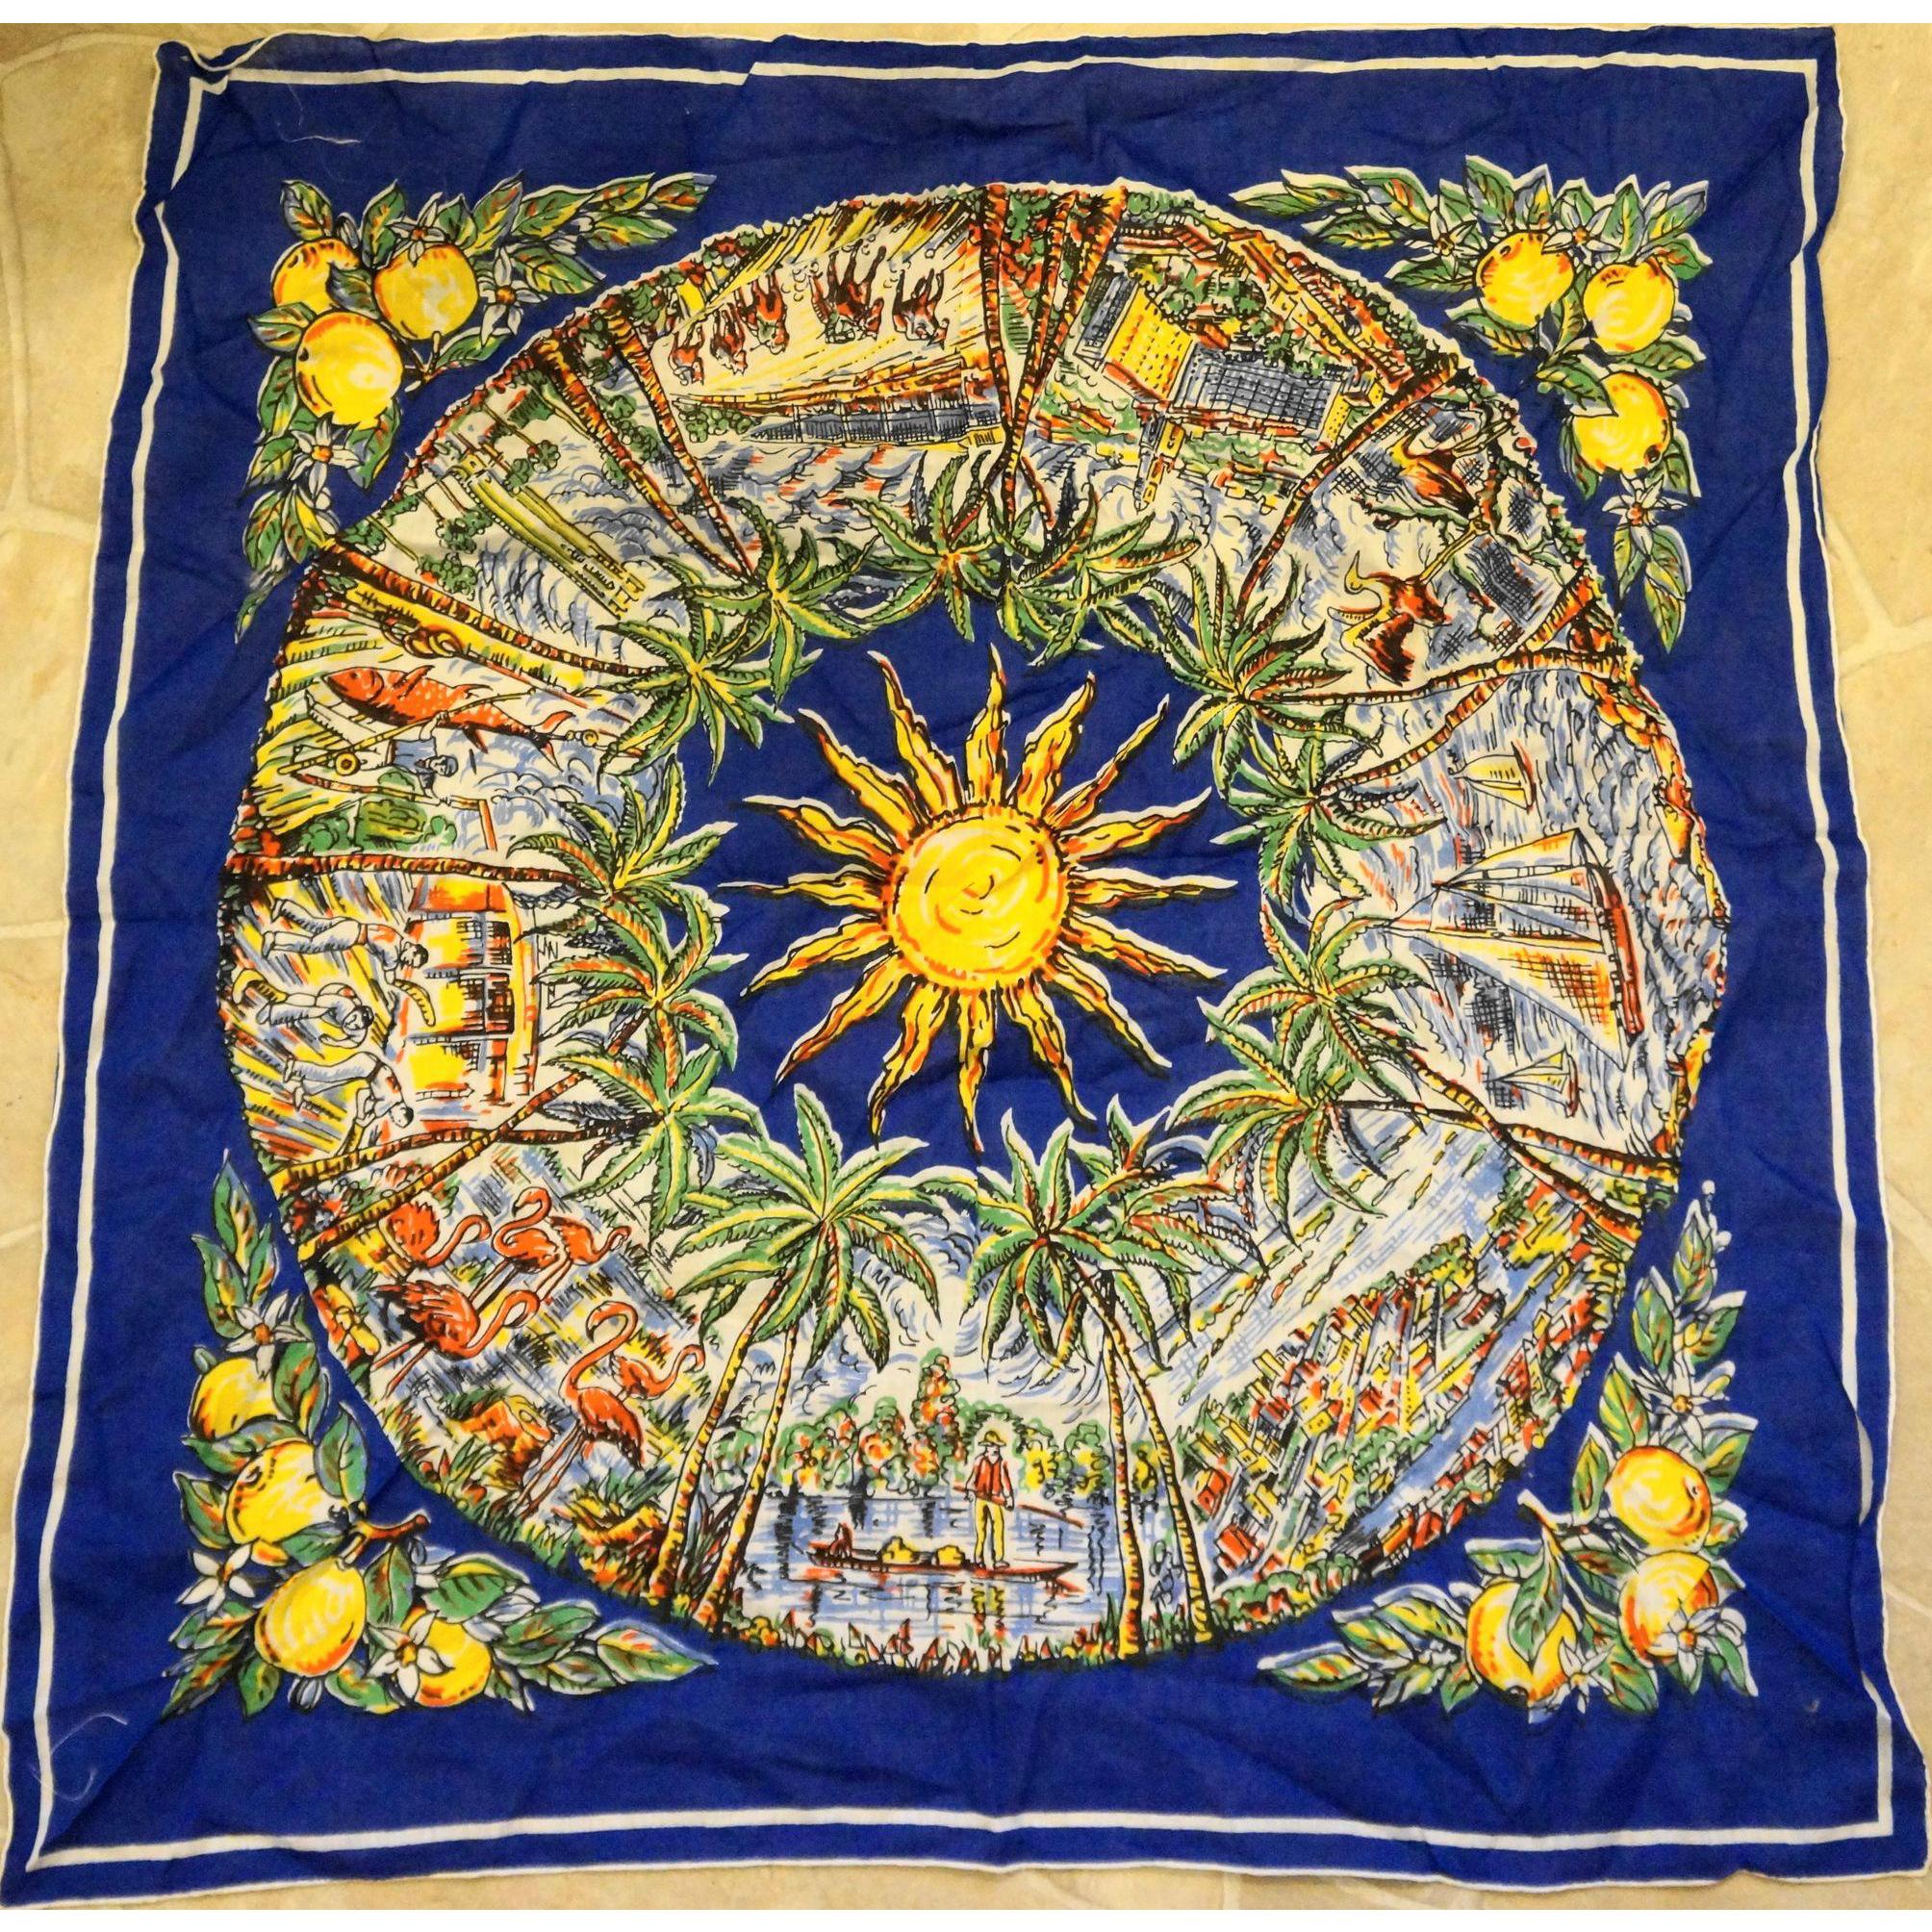 Florida Souvenir Cotton Printed Scarf Blue 26 IN Square